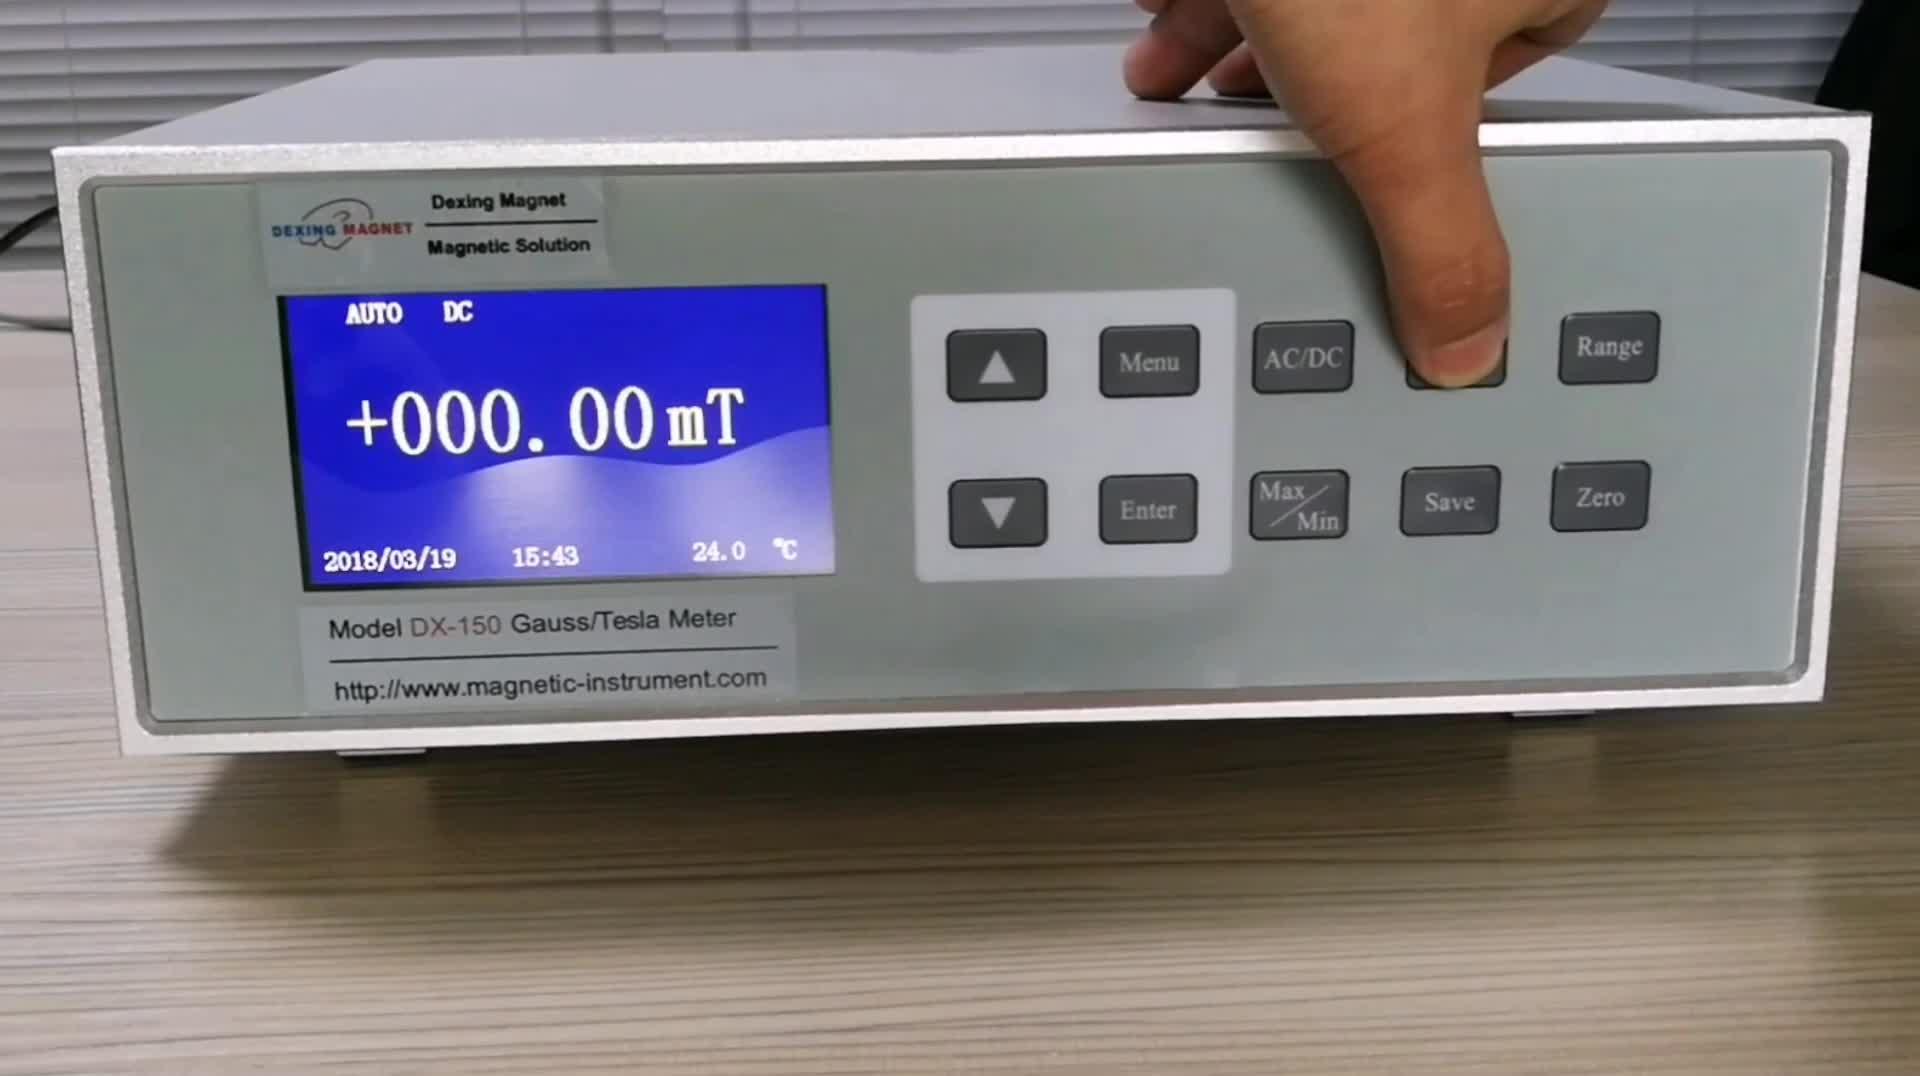 DX-150 AC/DC gauss meter/tesla meter